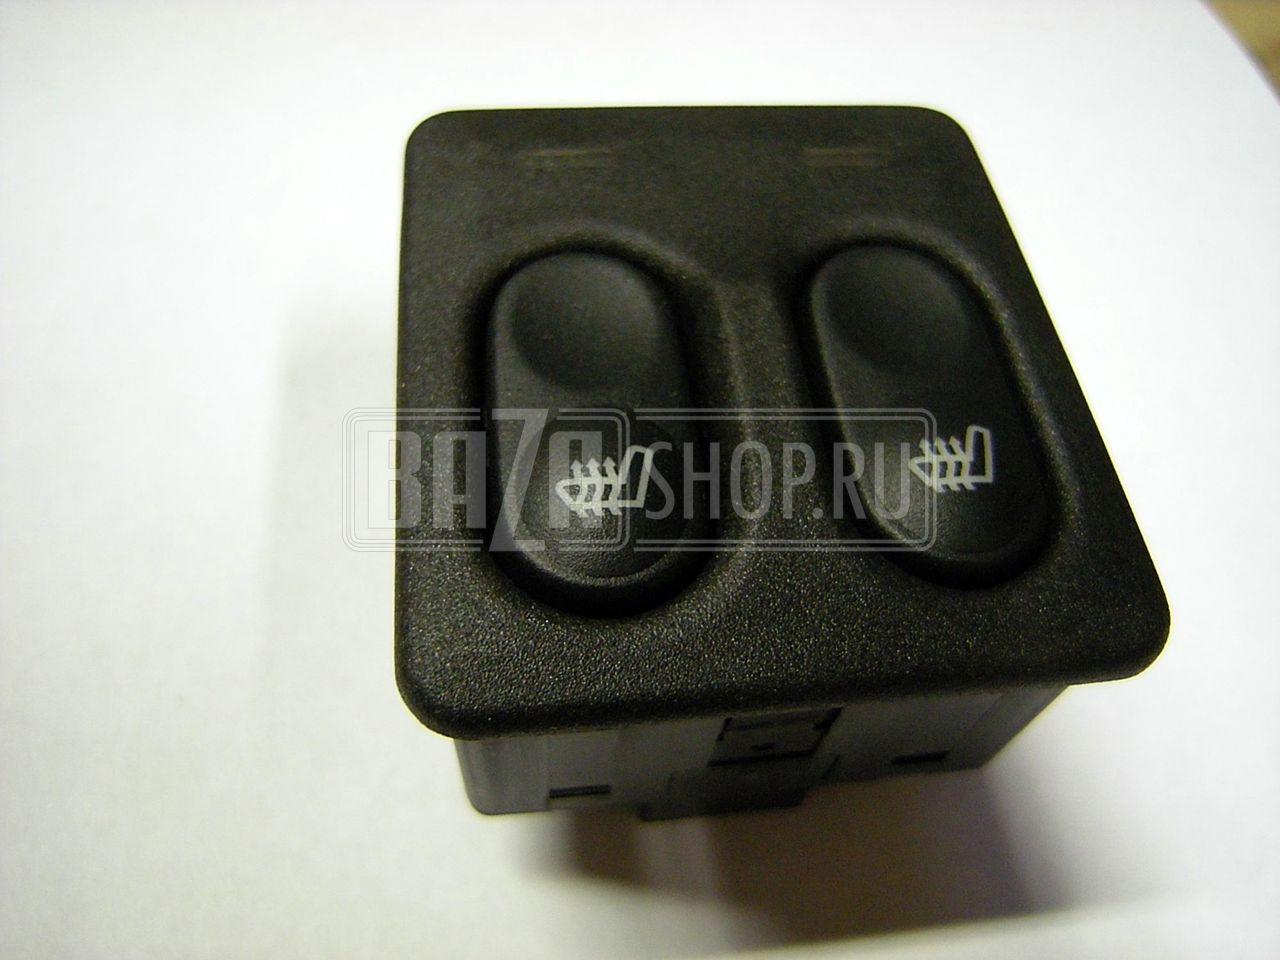 Hyundai Getz Club Волгоград.  Блок подогрева сидений ВАЗ 2110-3709710.